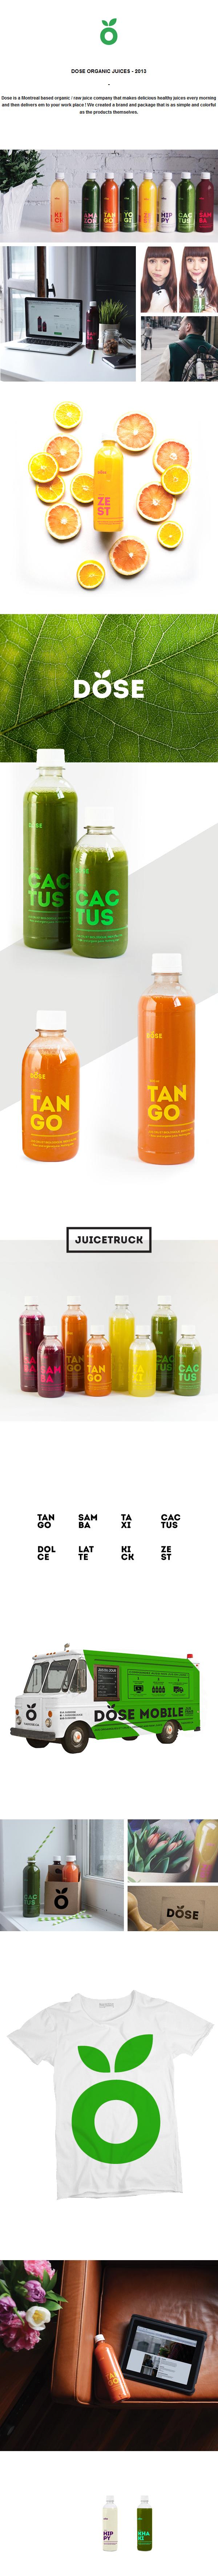 Dose organic juice